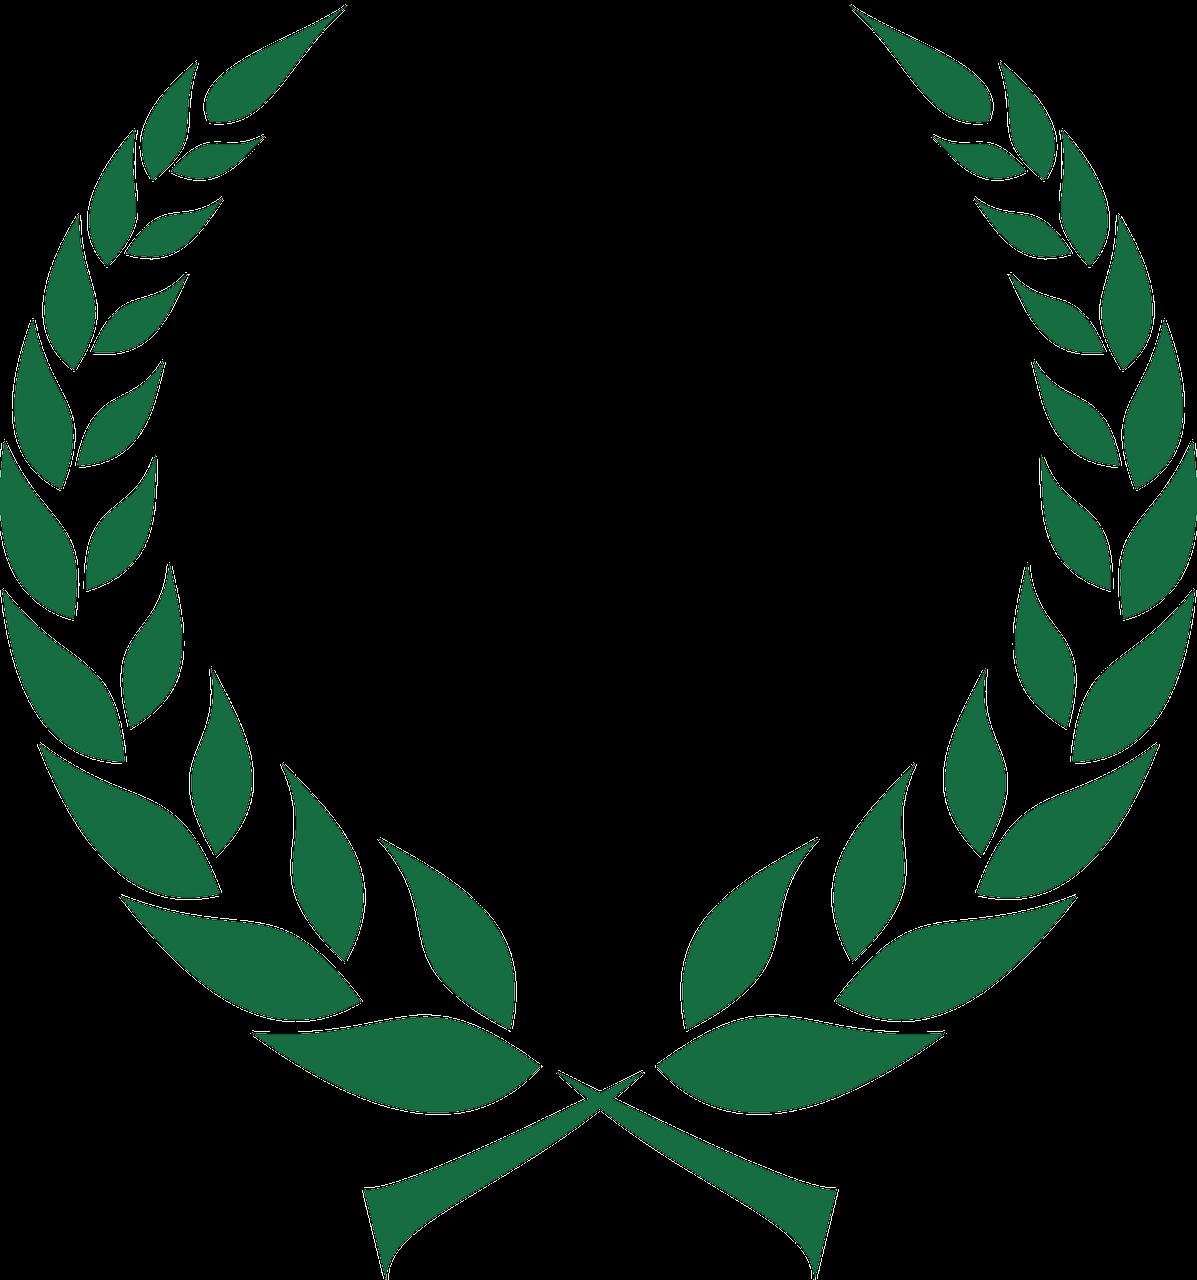 Free Image On Pixabay Olympics Award Caesar Crown Laurel Tattoo Wreath Clip Art Laurel Wreath